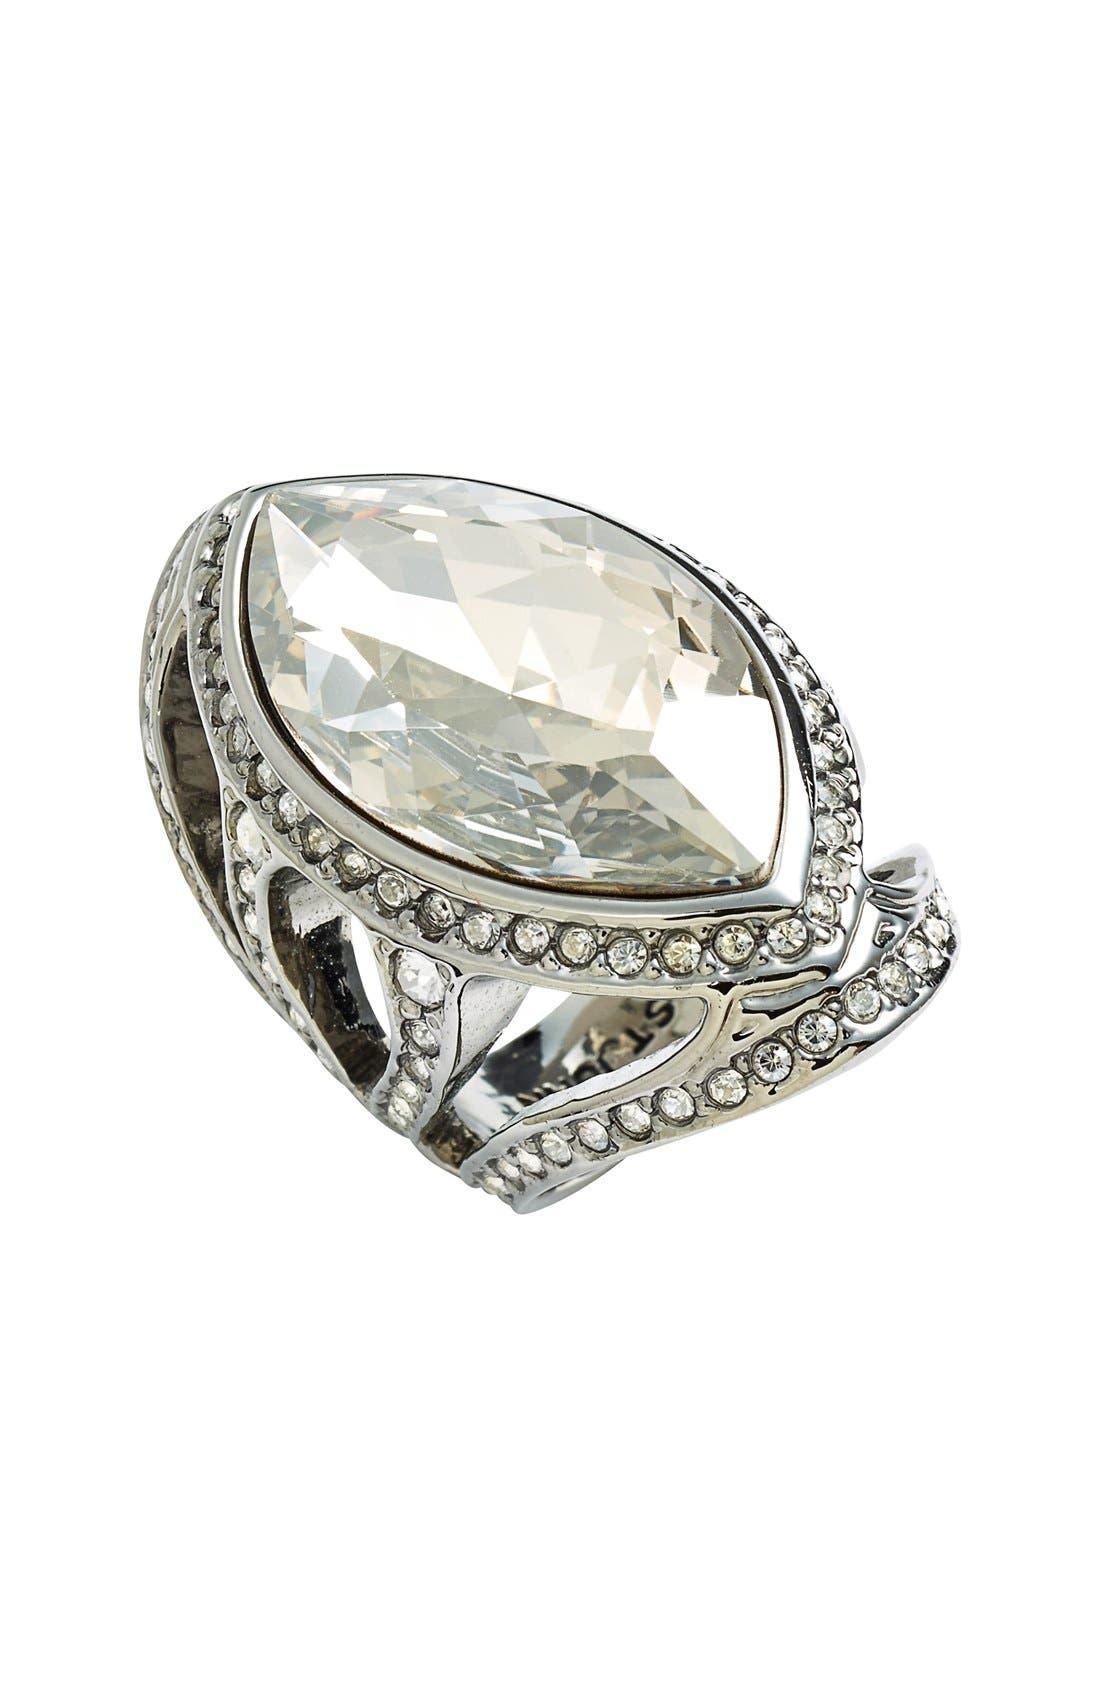 Main Image - St. John Collection Swarovski Crystal Cocktail Ring